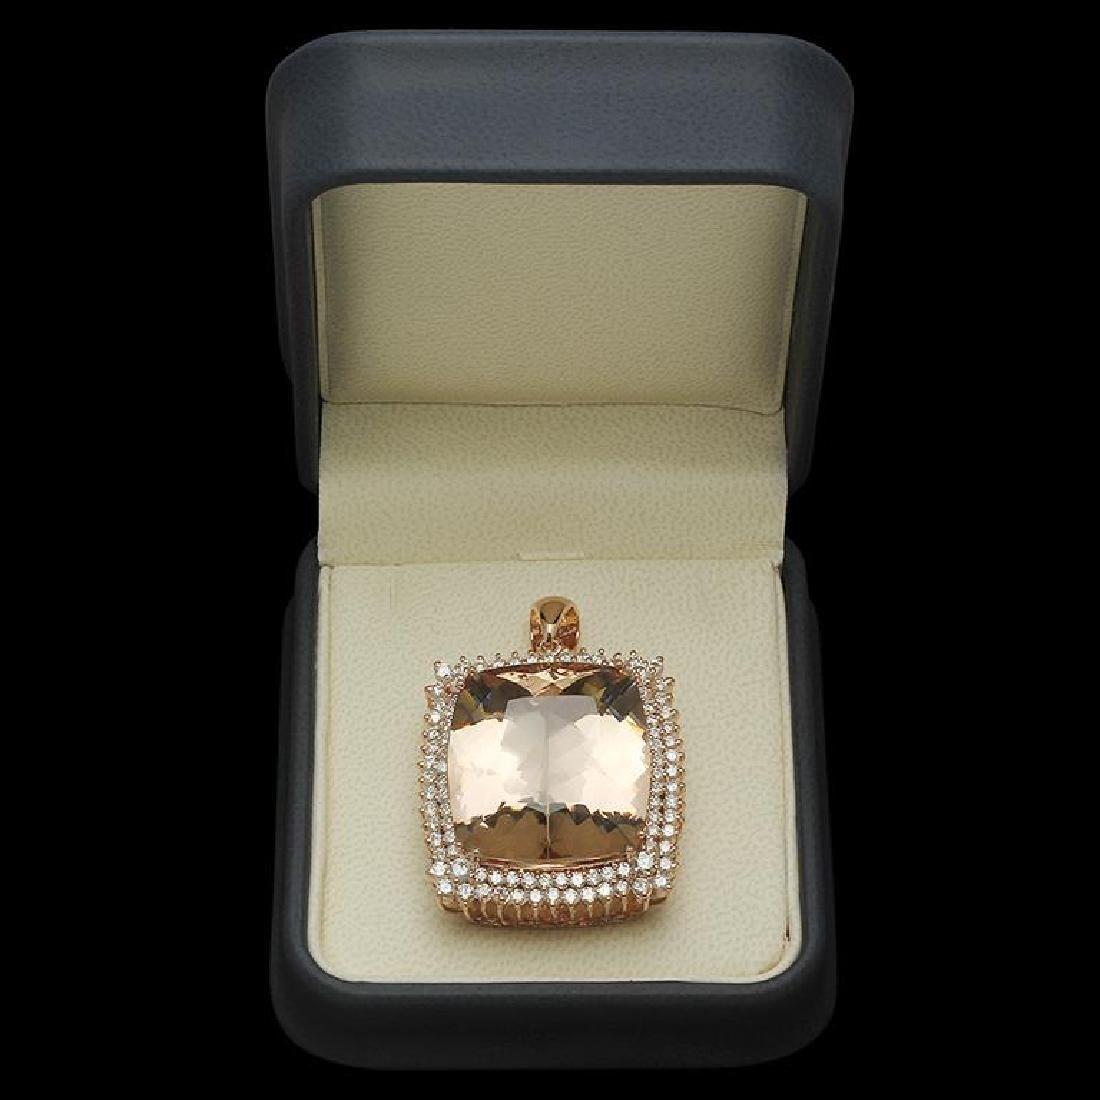 14K Gold 57.18ct Morganite 4.17ct Diamond Pendant - 2